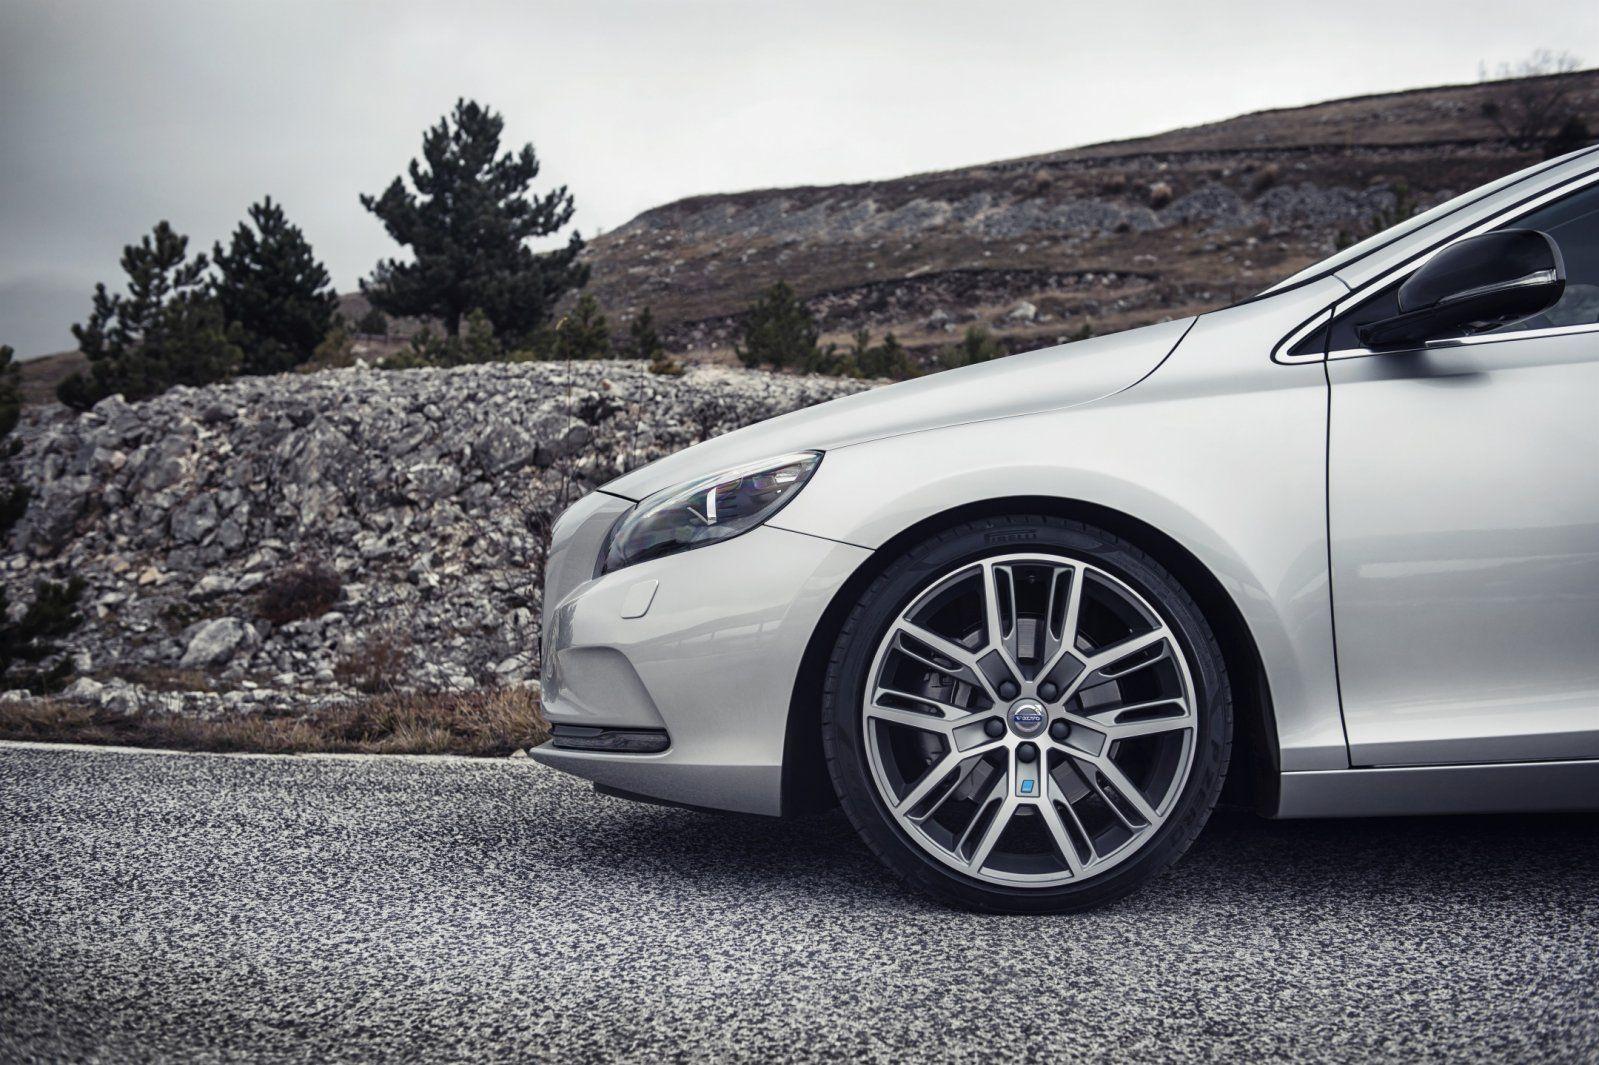 Polestar levert Performance parts voor Volvo V40, S60, V60